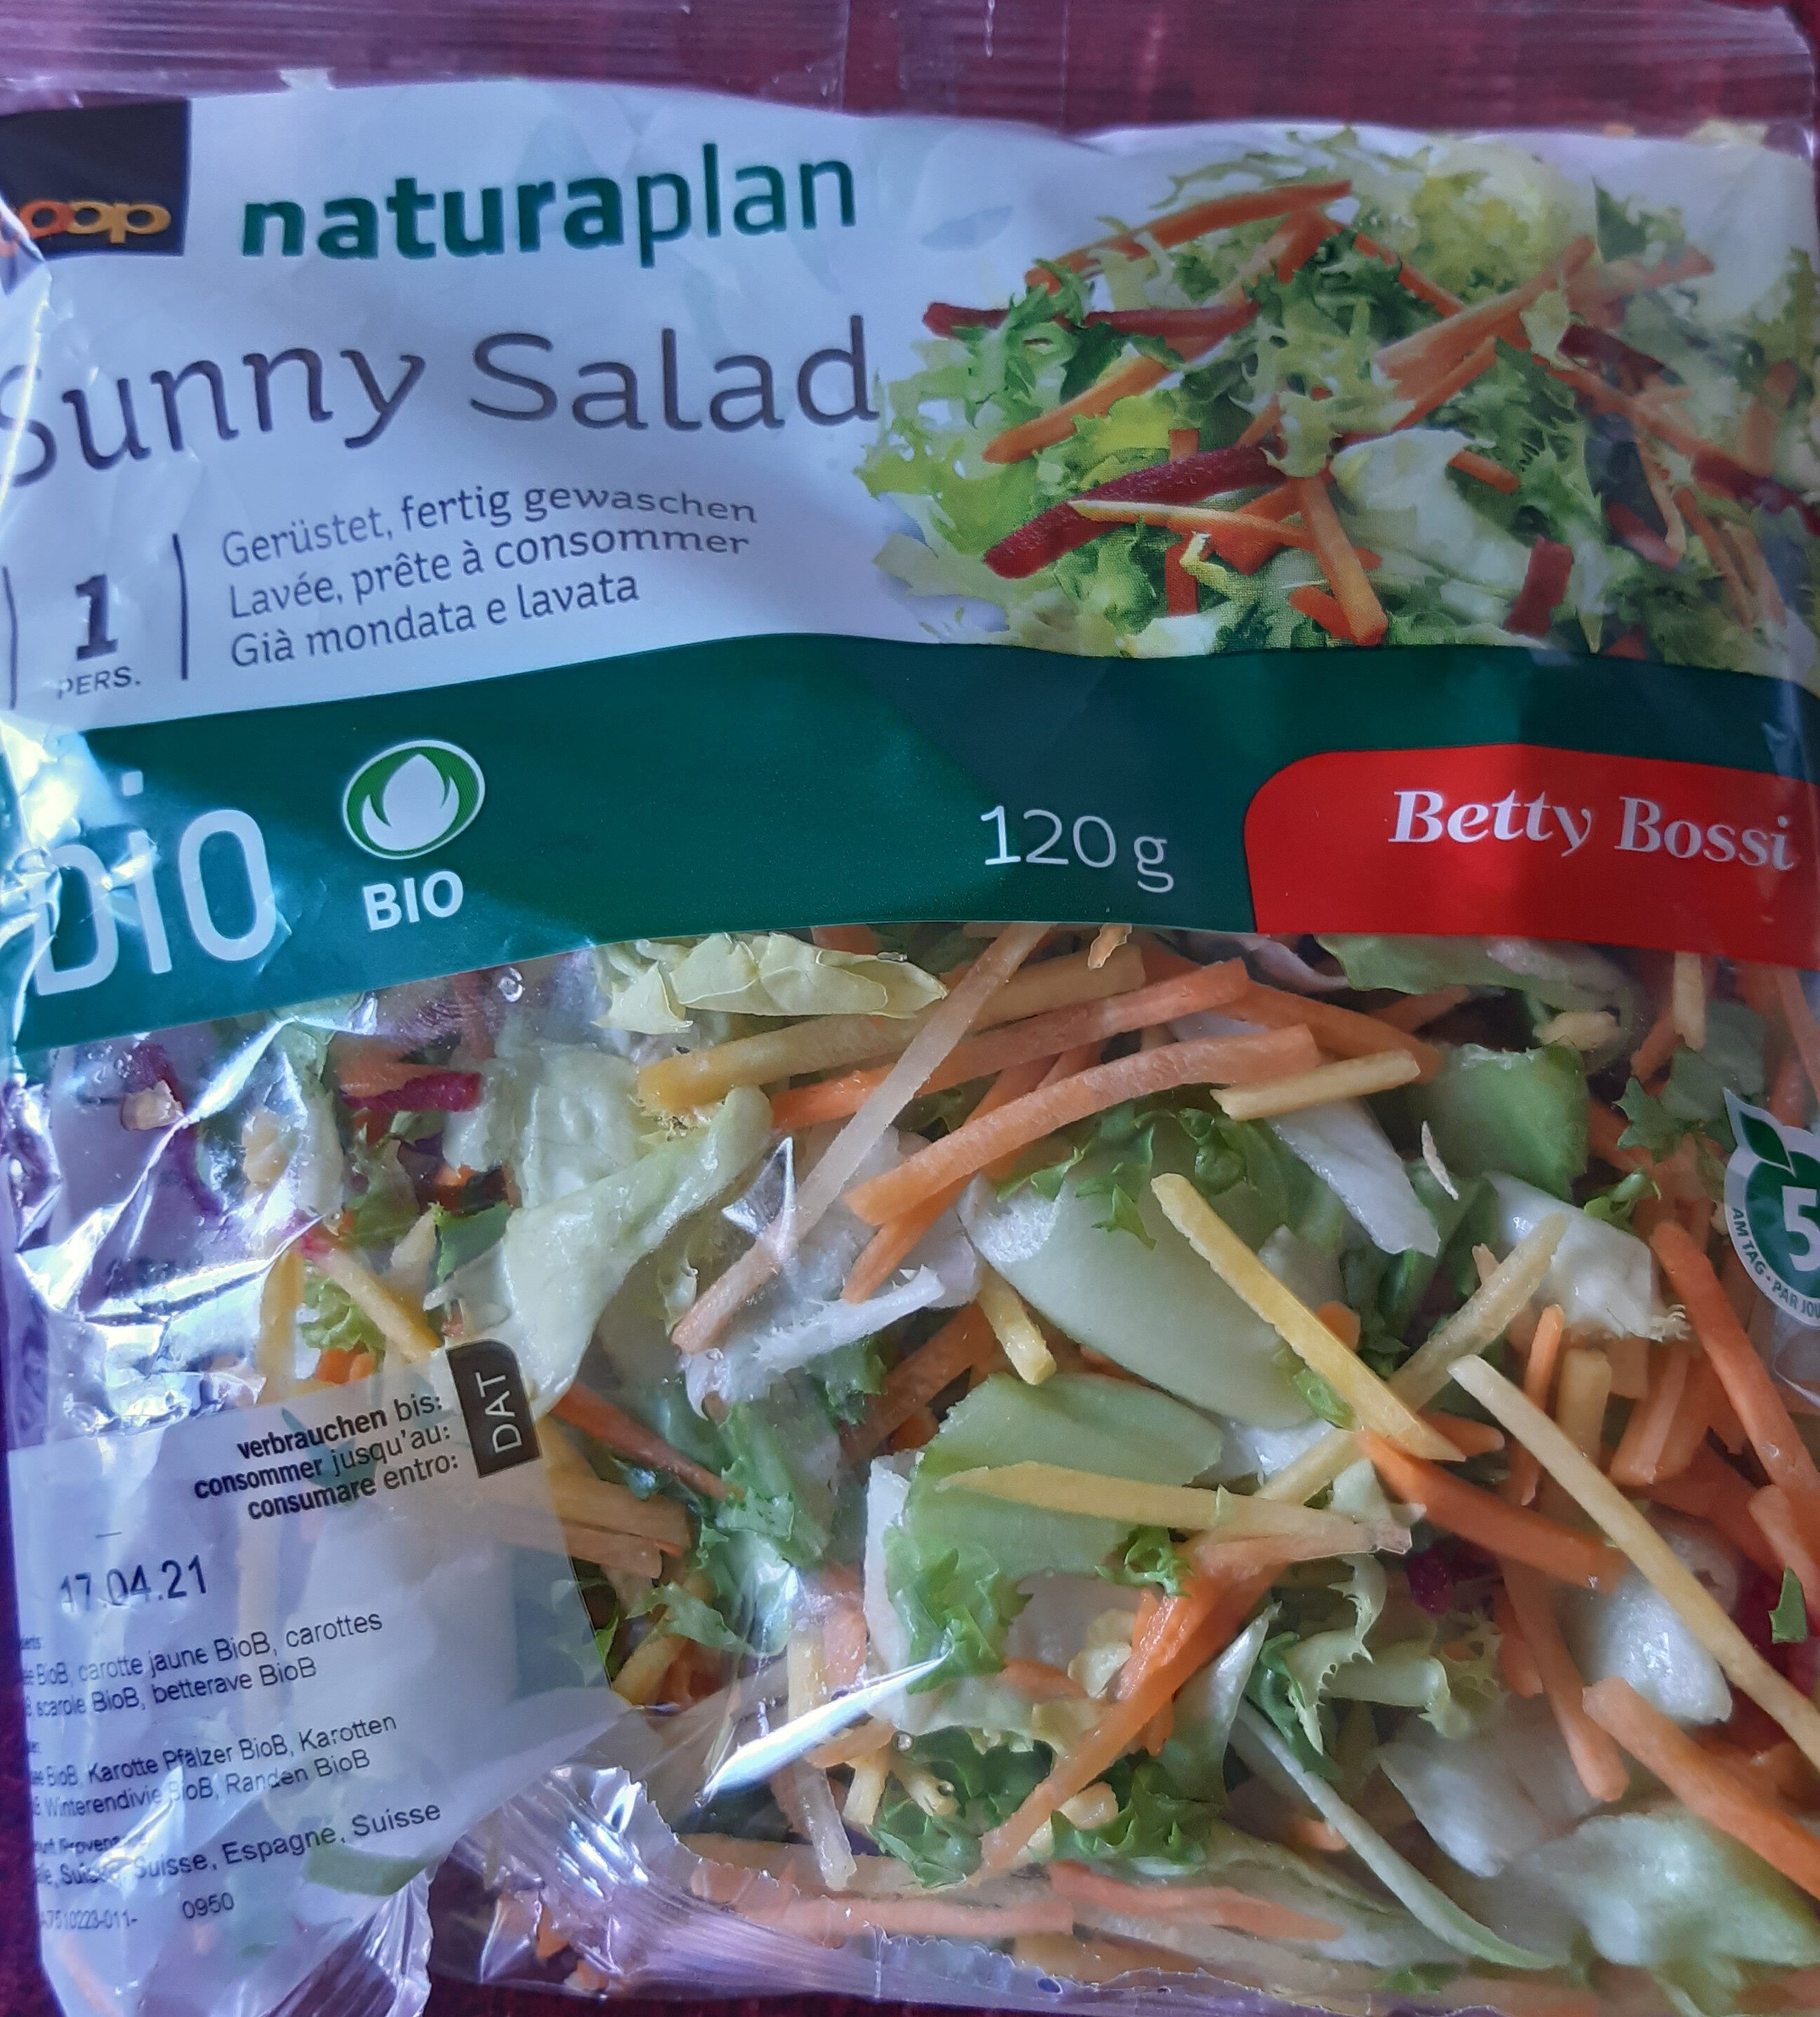 Sunny Salad - Product - fr